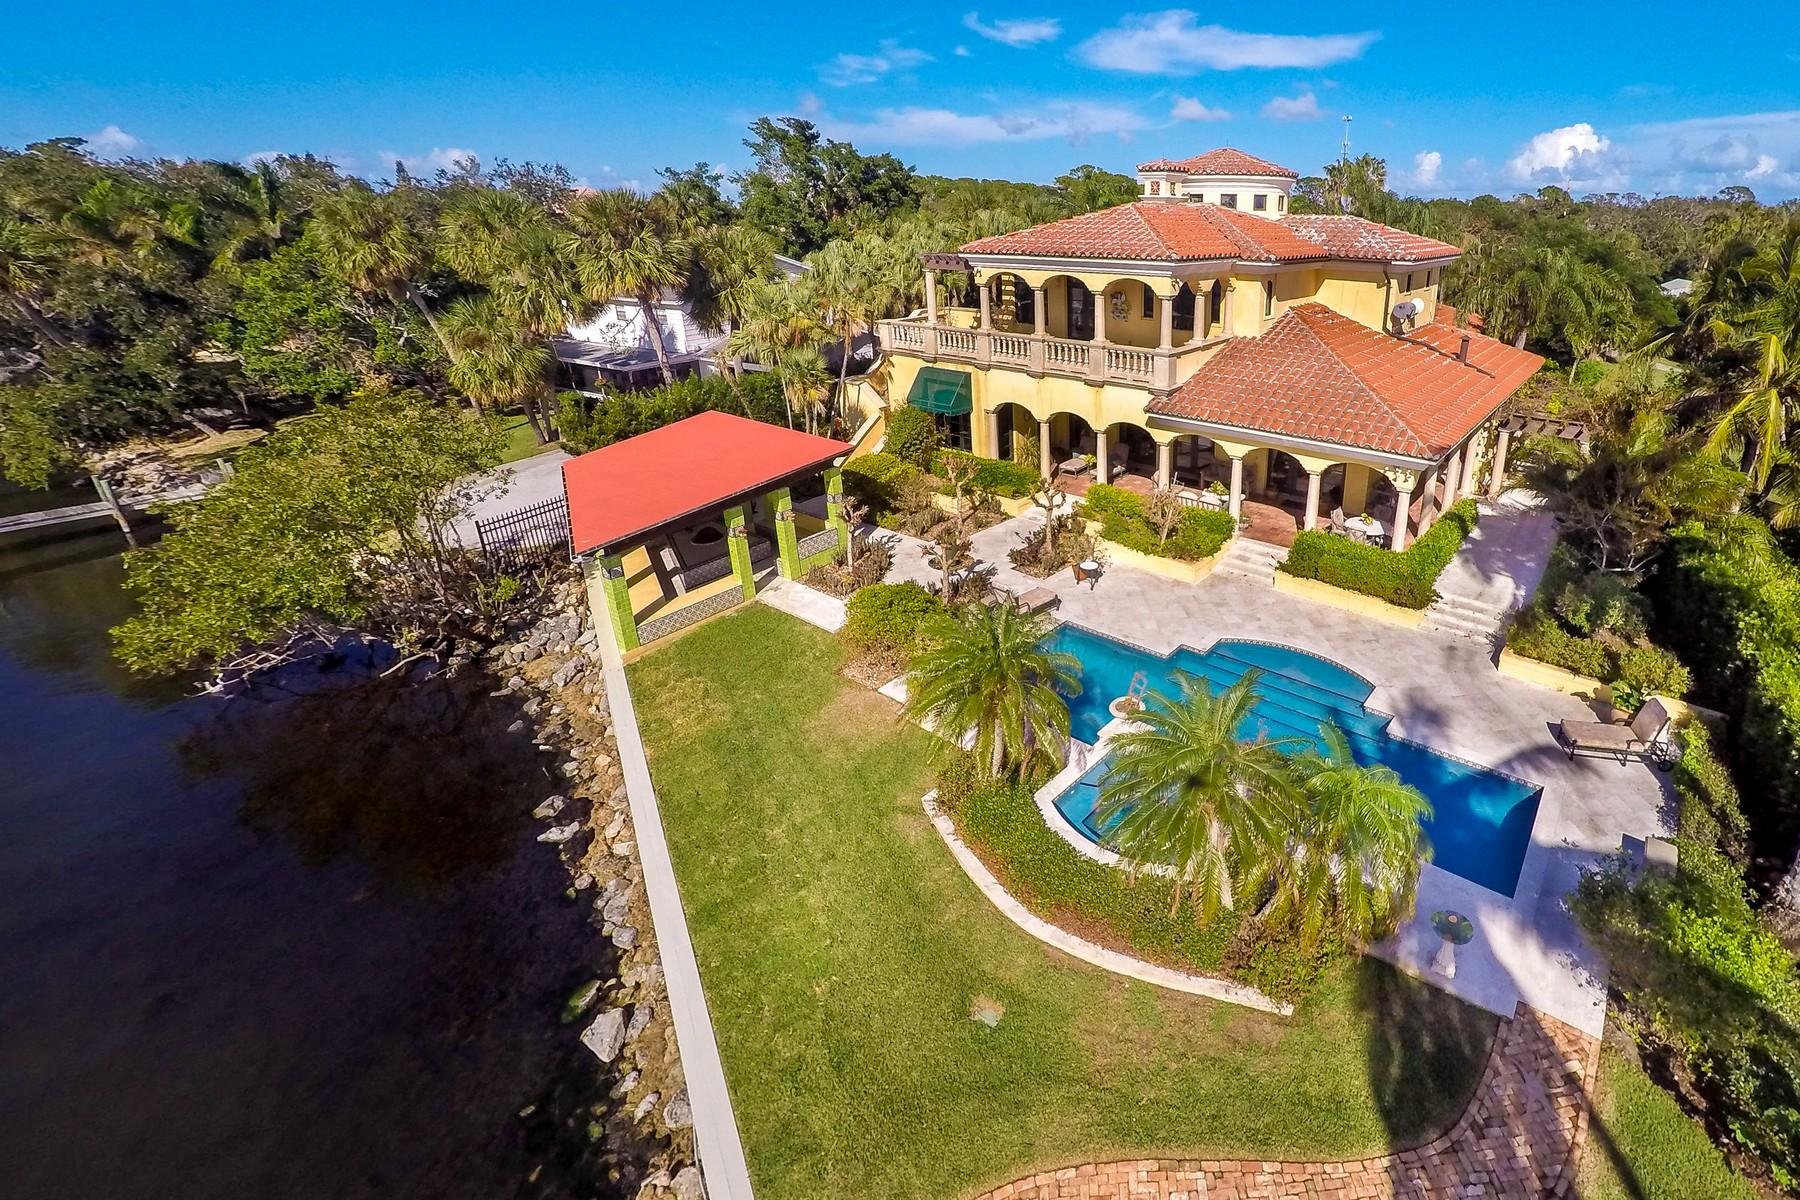 Additional photo for property listing at 3840 Riverside Drive 3840 Riverside Drive Indialantic, Florida 32903 Estados Unidos